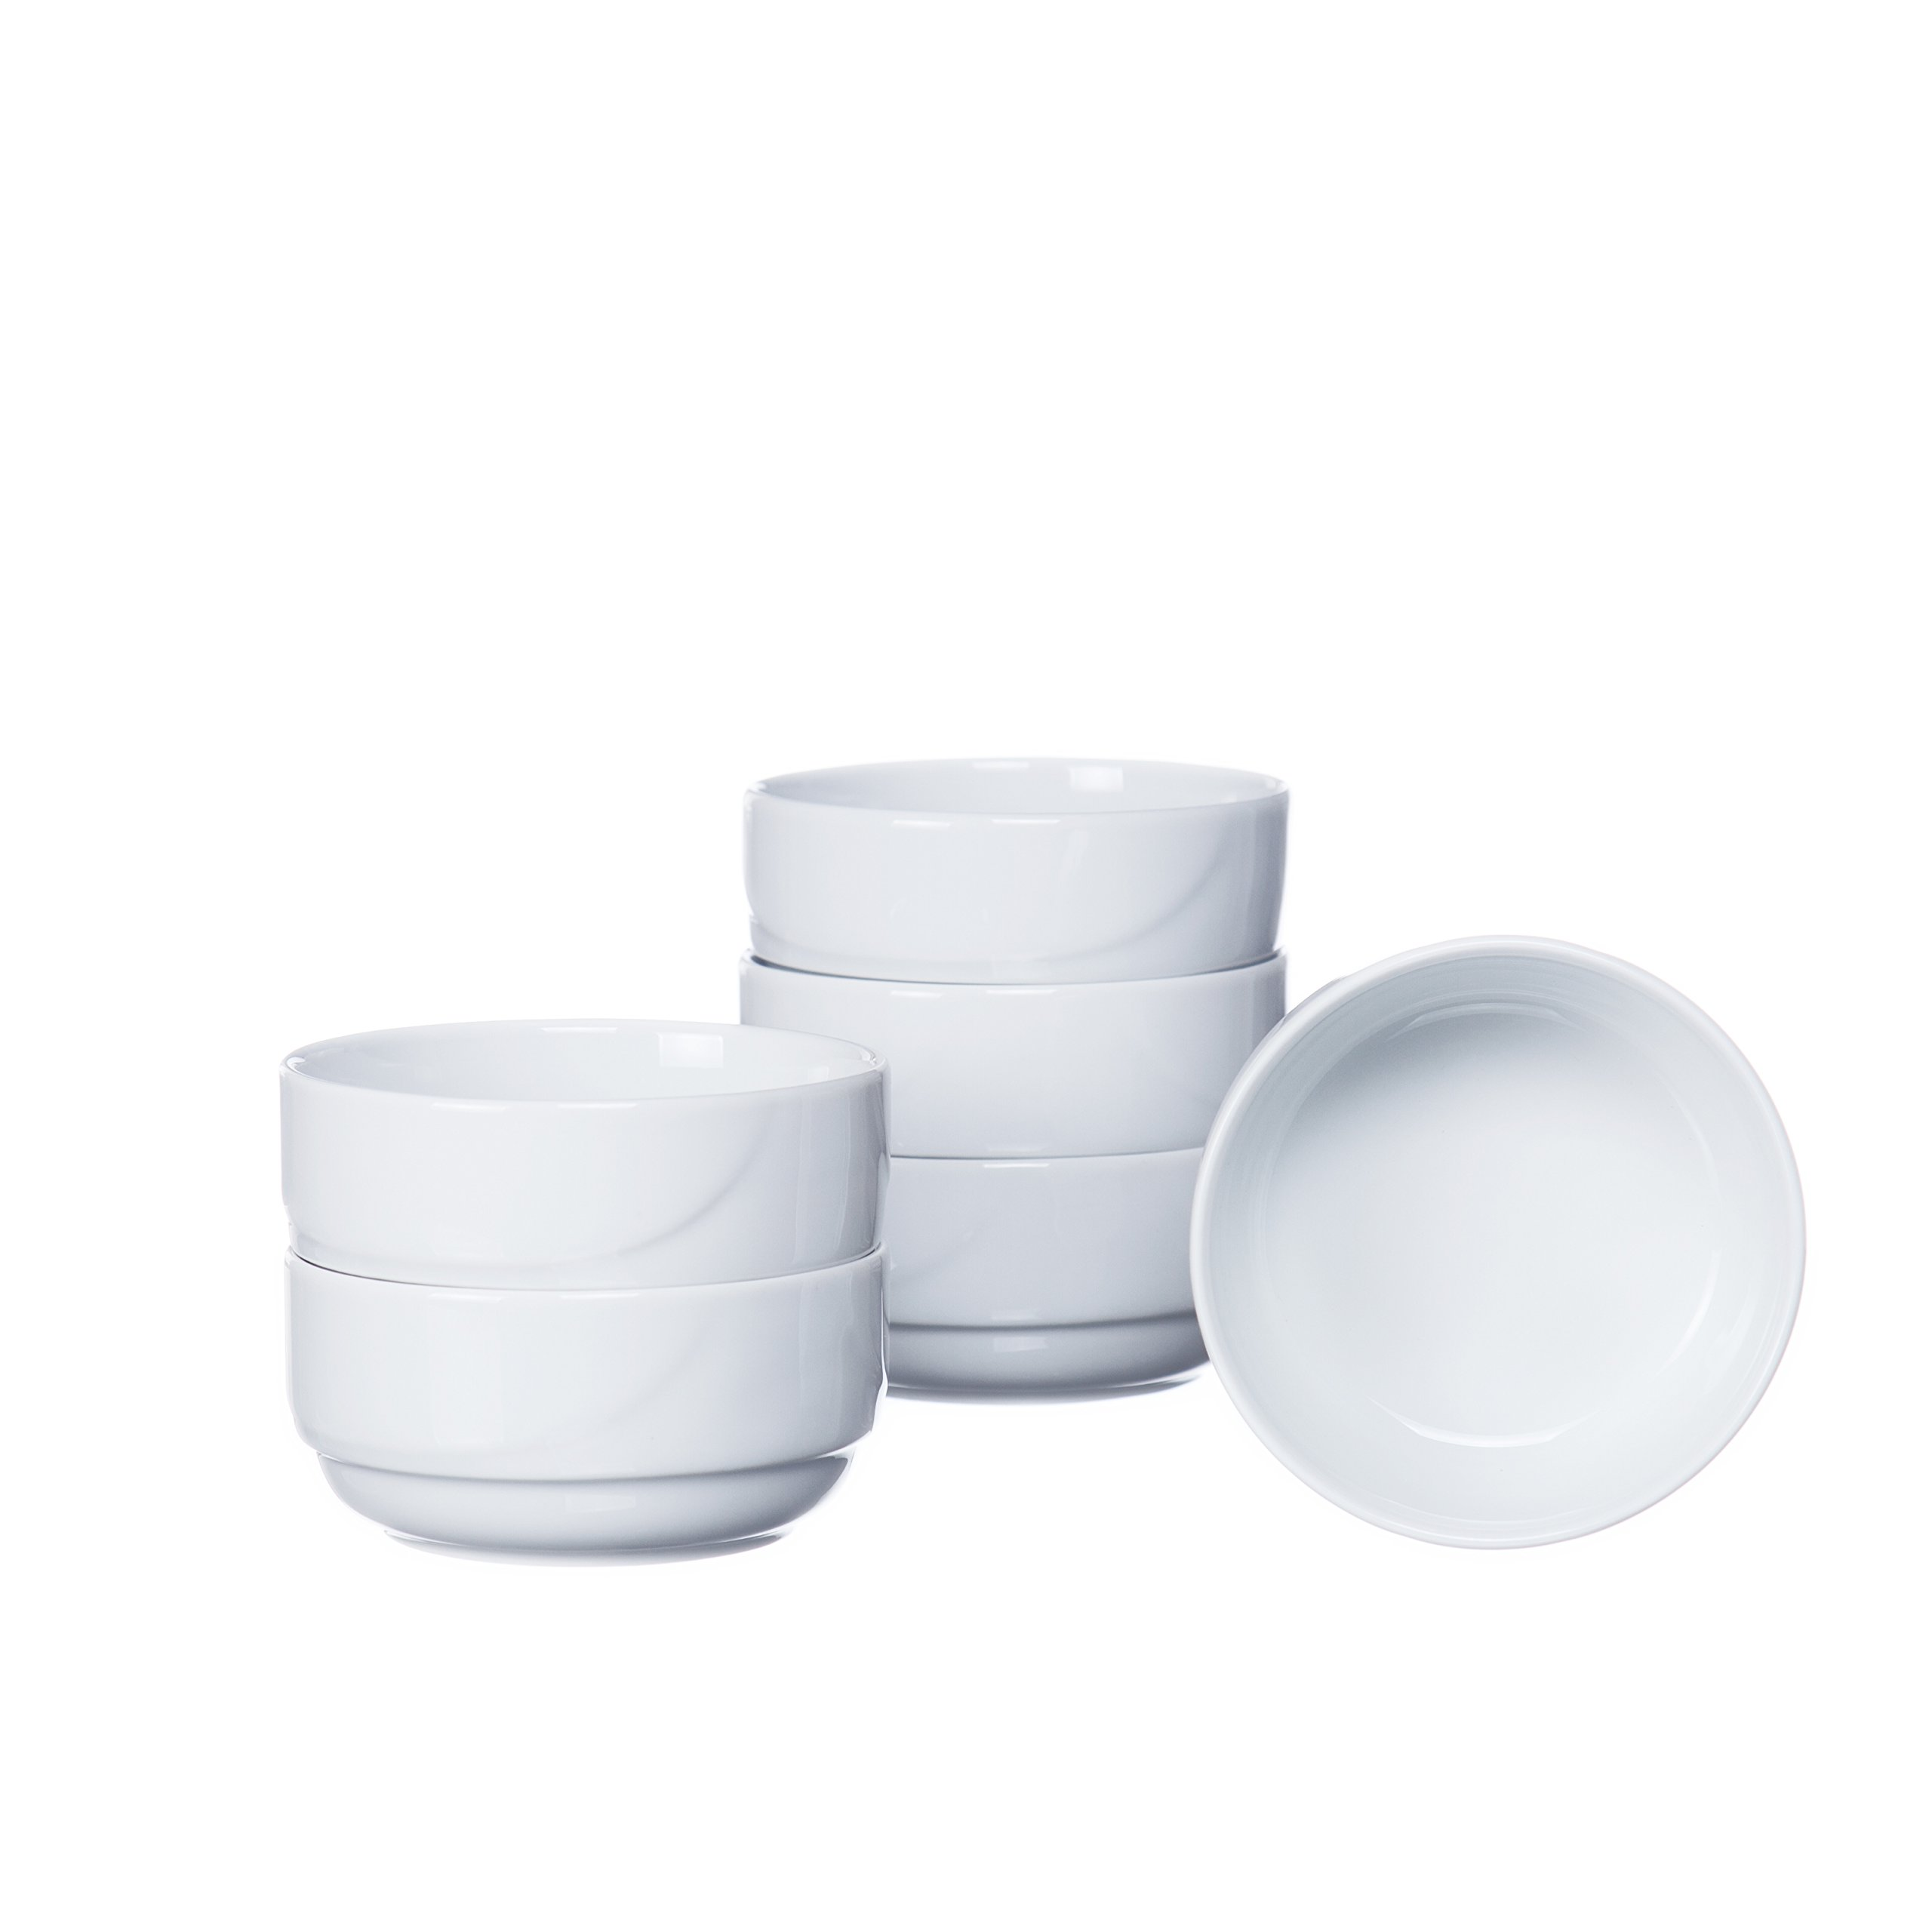 Soup/Cereal BOWLS without Handles (4-piece, 6-piece, 12-piece Sets), 13 Oz, White Porcelain, Restaurant&Hotel Quality (4)